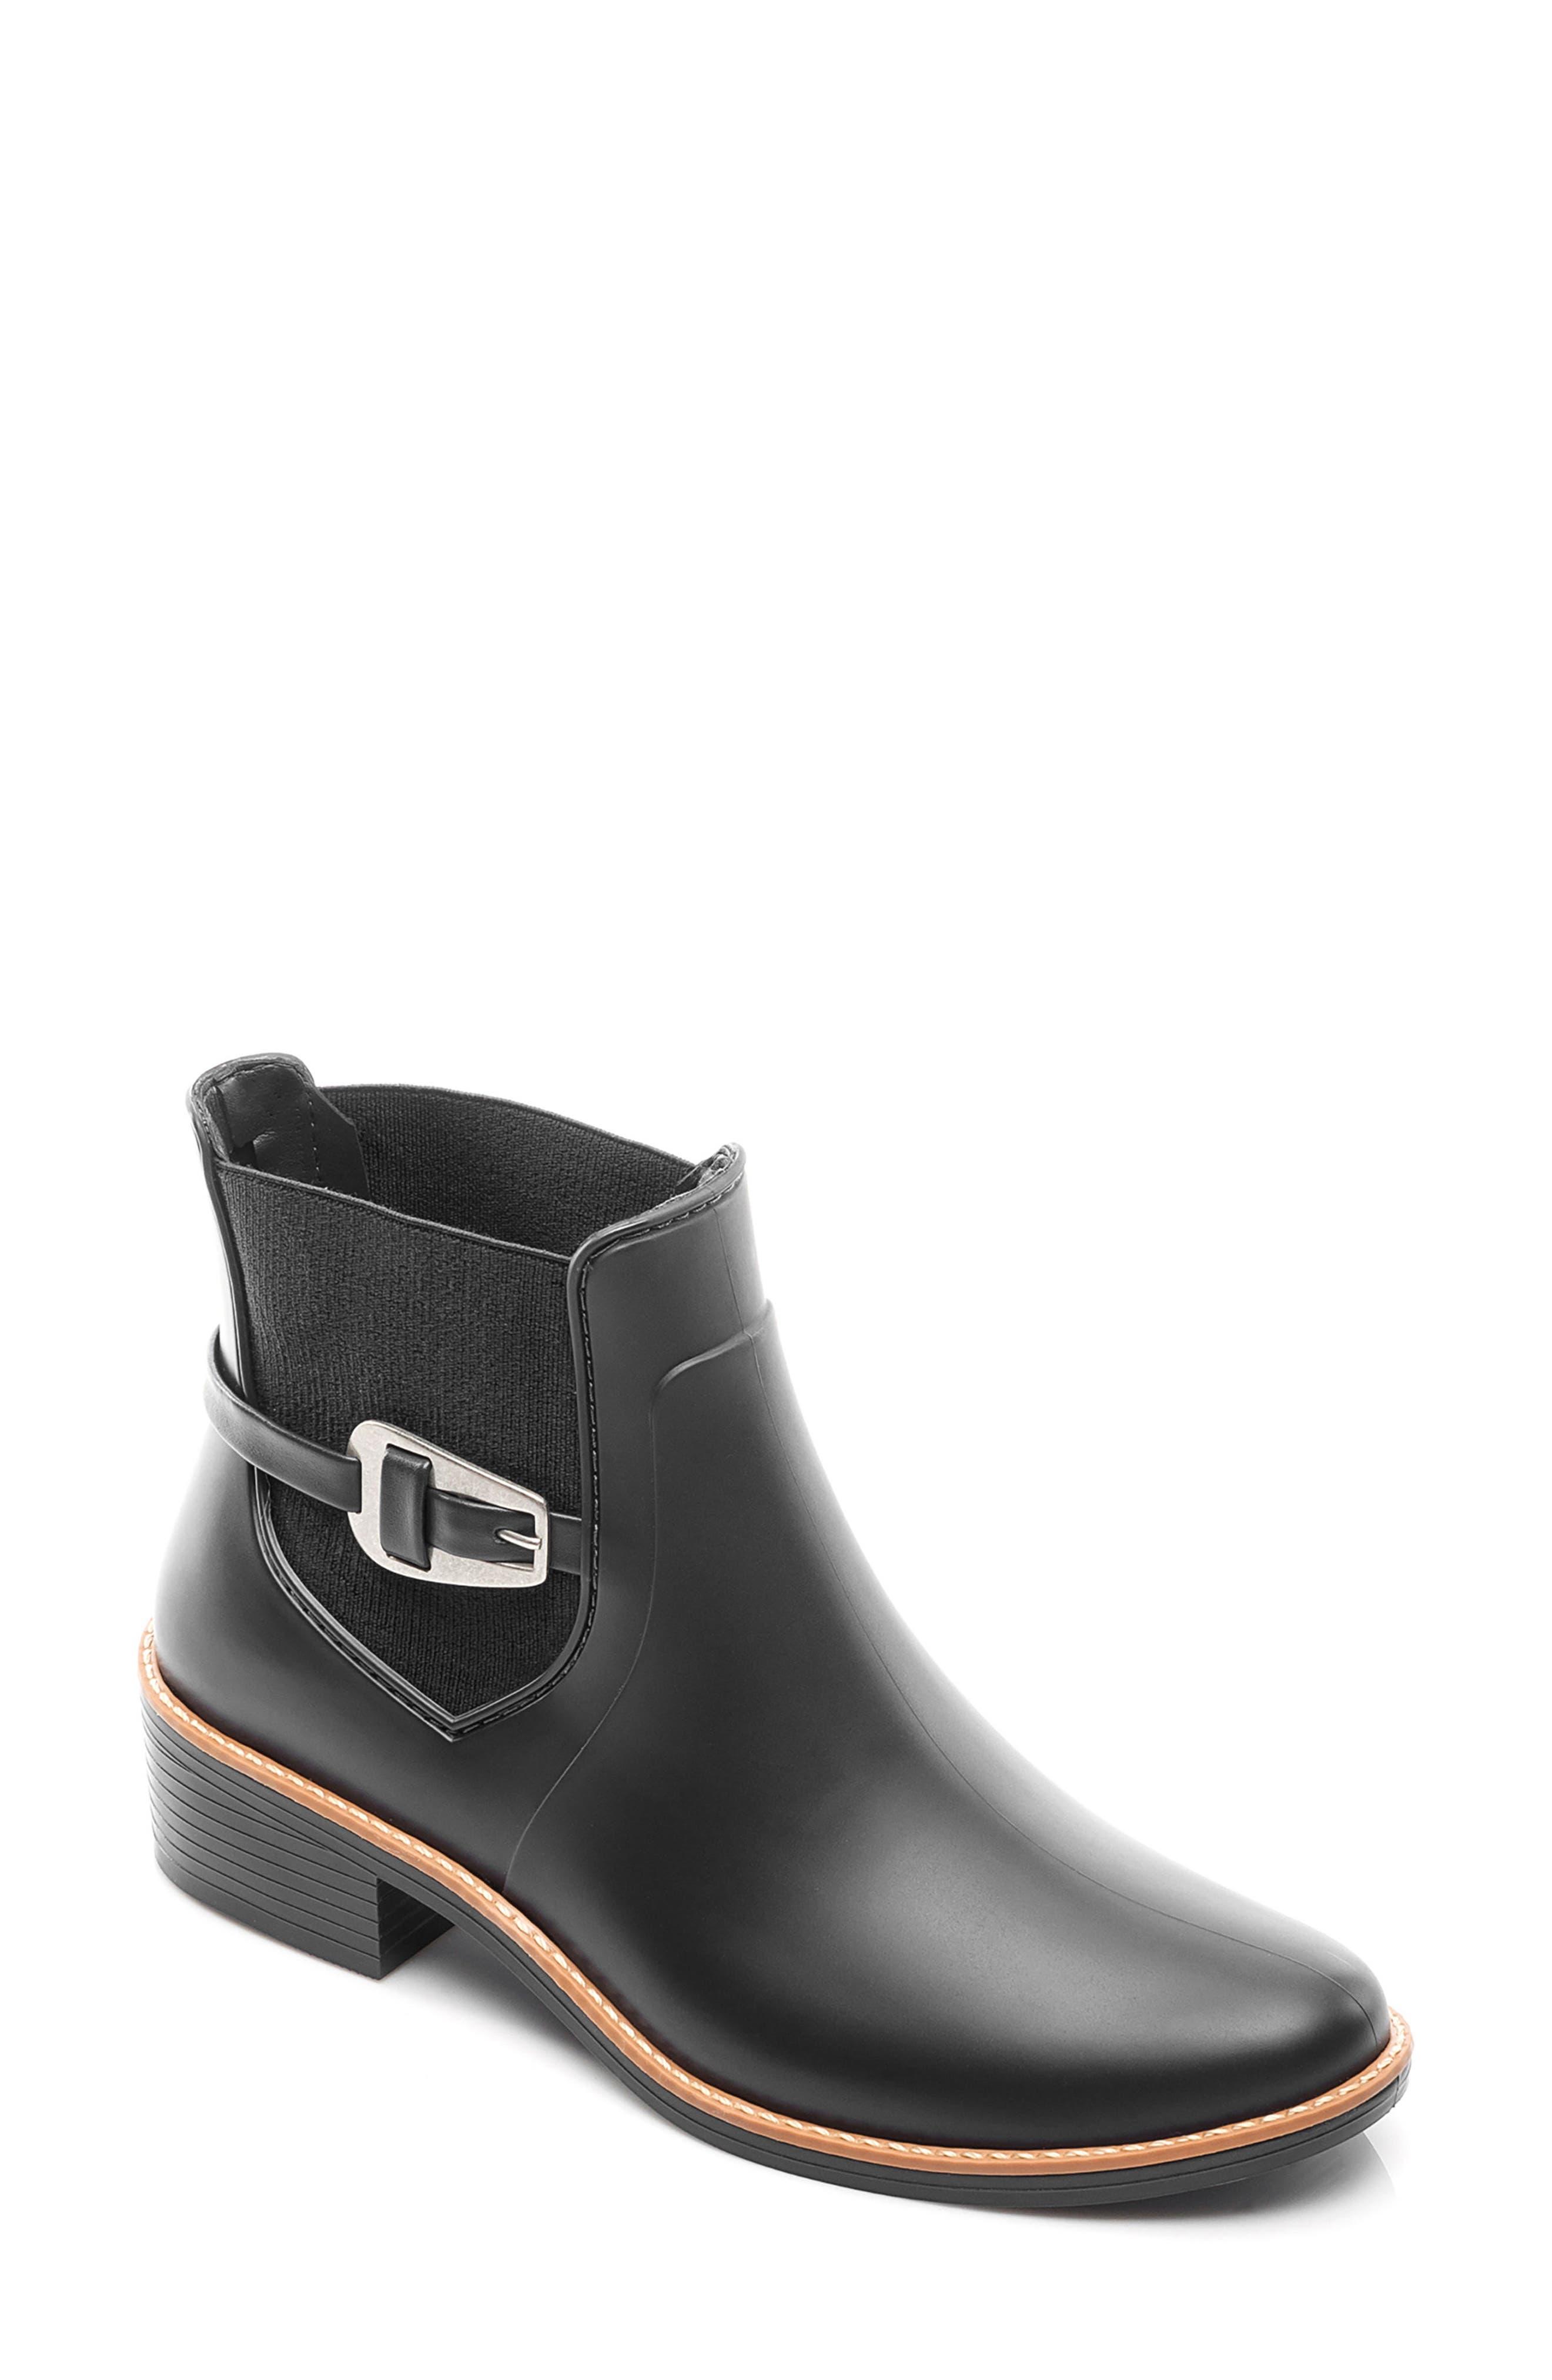 Alternate Image 1 Selected - Bernardo Footwear Pansie Rain Boot (Women)